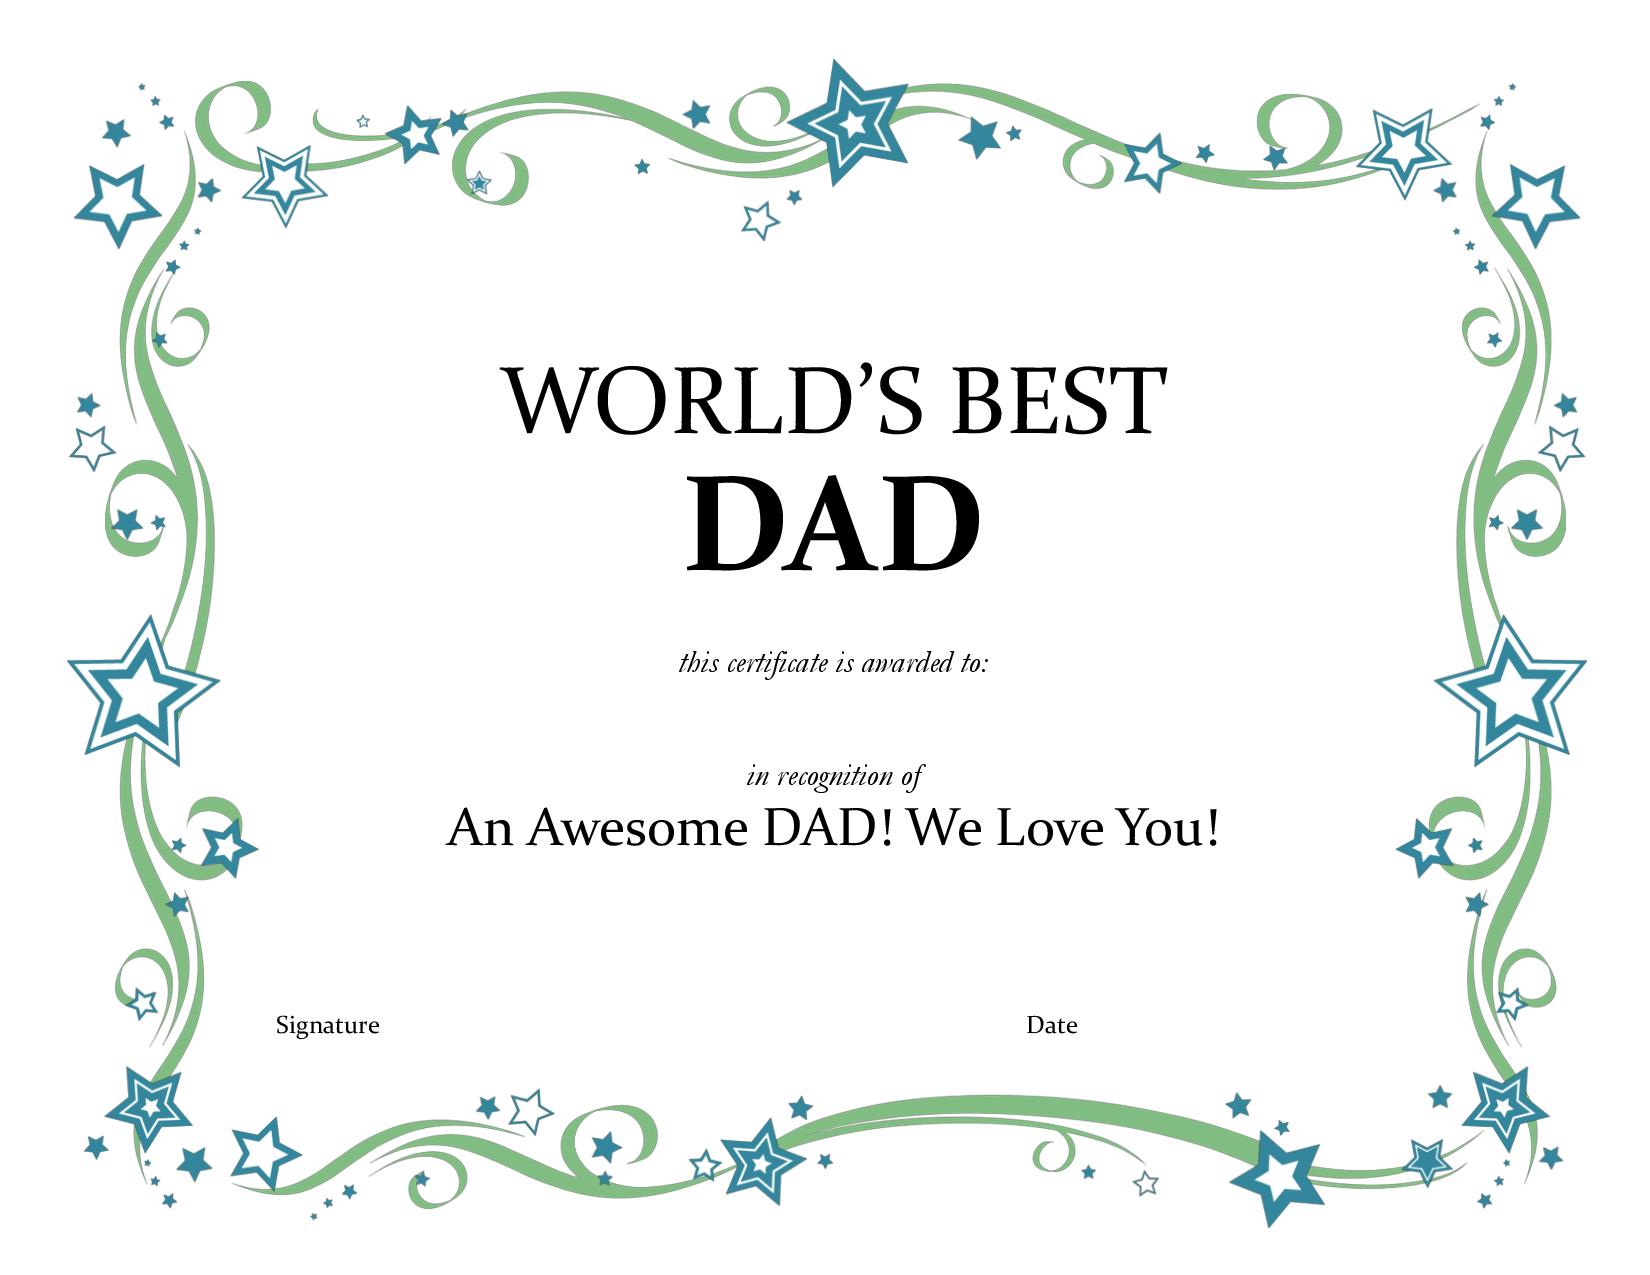 Worlds best dad certificatepdf by joe31255 i like pinterest worlds best dad certificatepdf by joe31255 yadclub Images